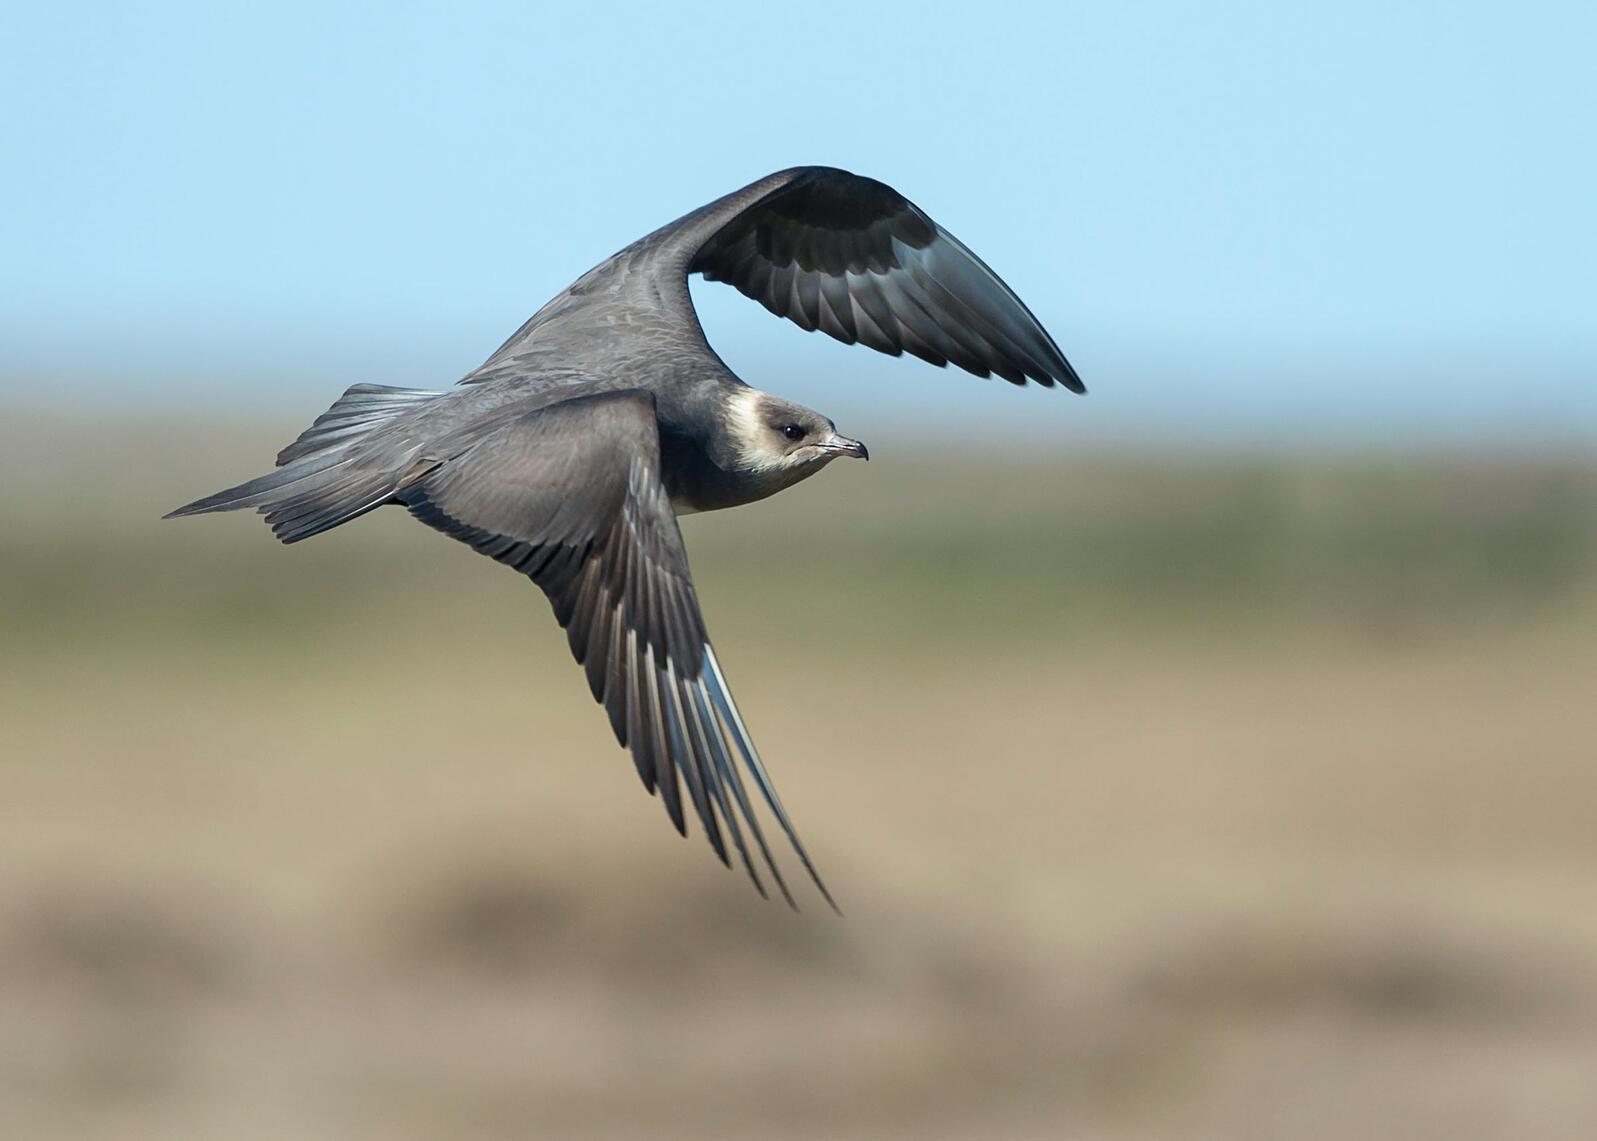 Parasitic Jaeger. Tom Ingram/Audubon Photography Awards